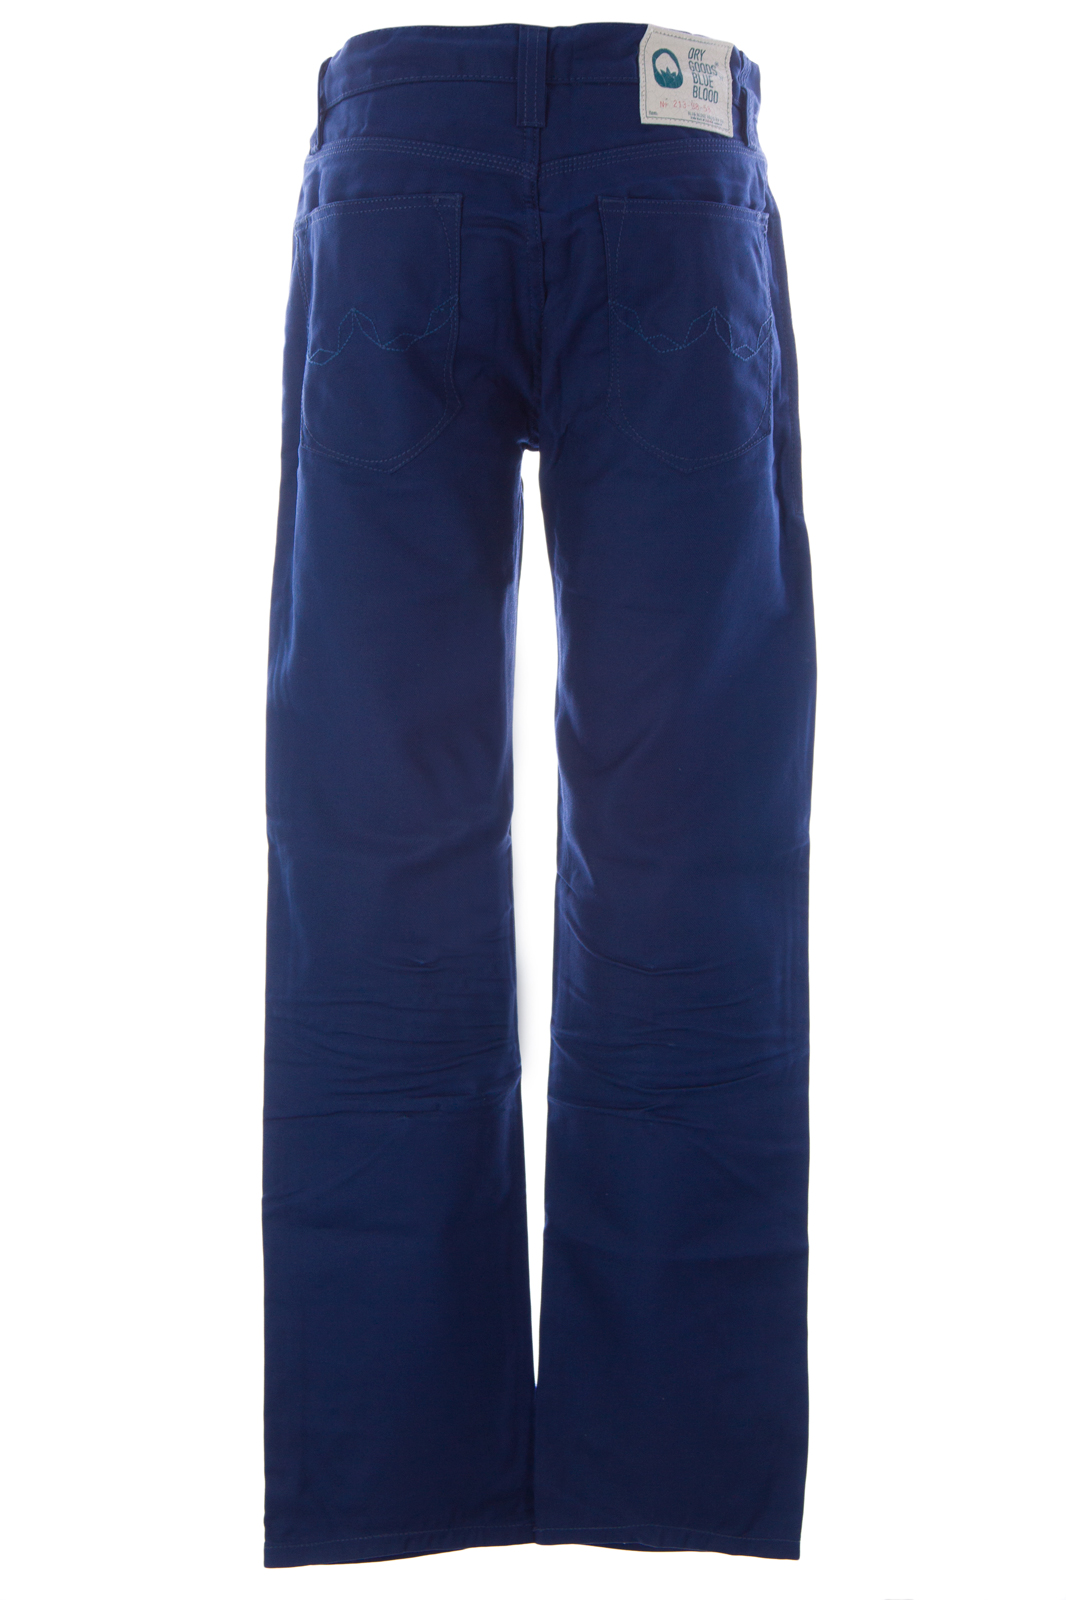 Blue Blood Men/'s Cross CT Denim Button Fly Jeans MBLW0640 $250 NWT